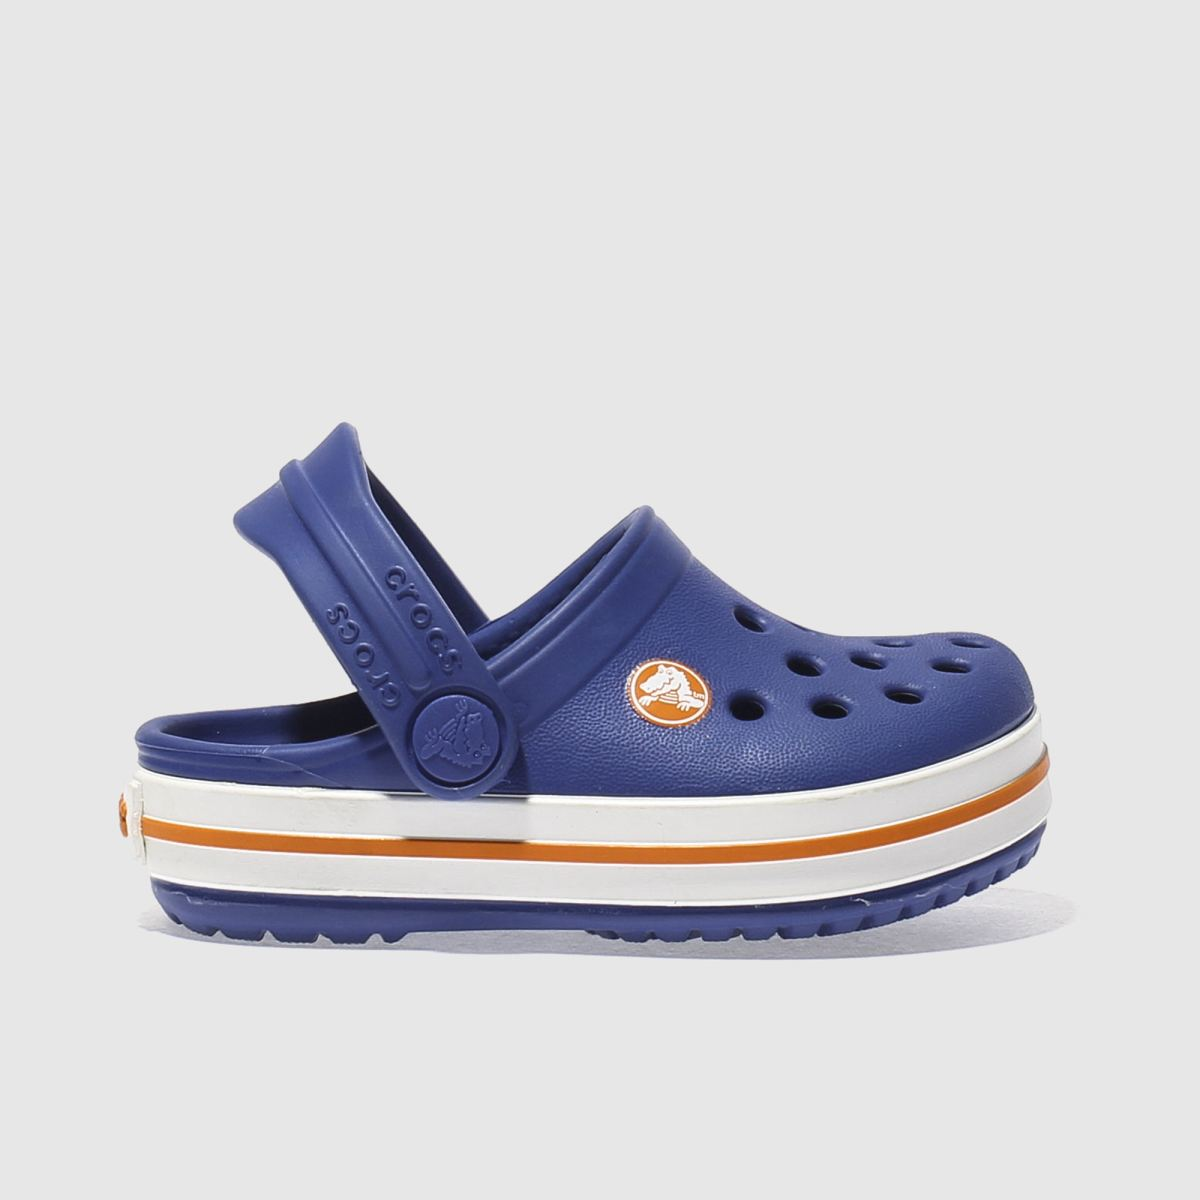 145be3ee9 Crocs Blue Crocband Clog Trainers Toddler - Schuh at Westquay - Shop Online